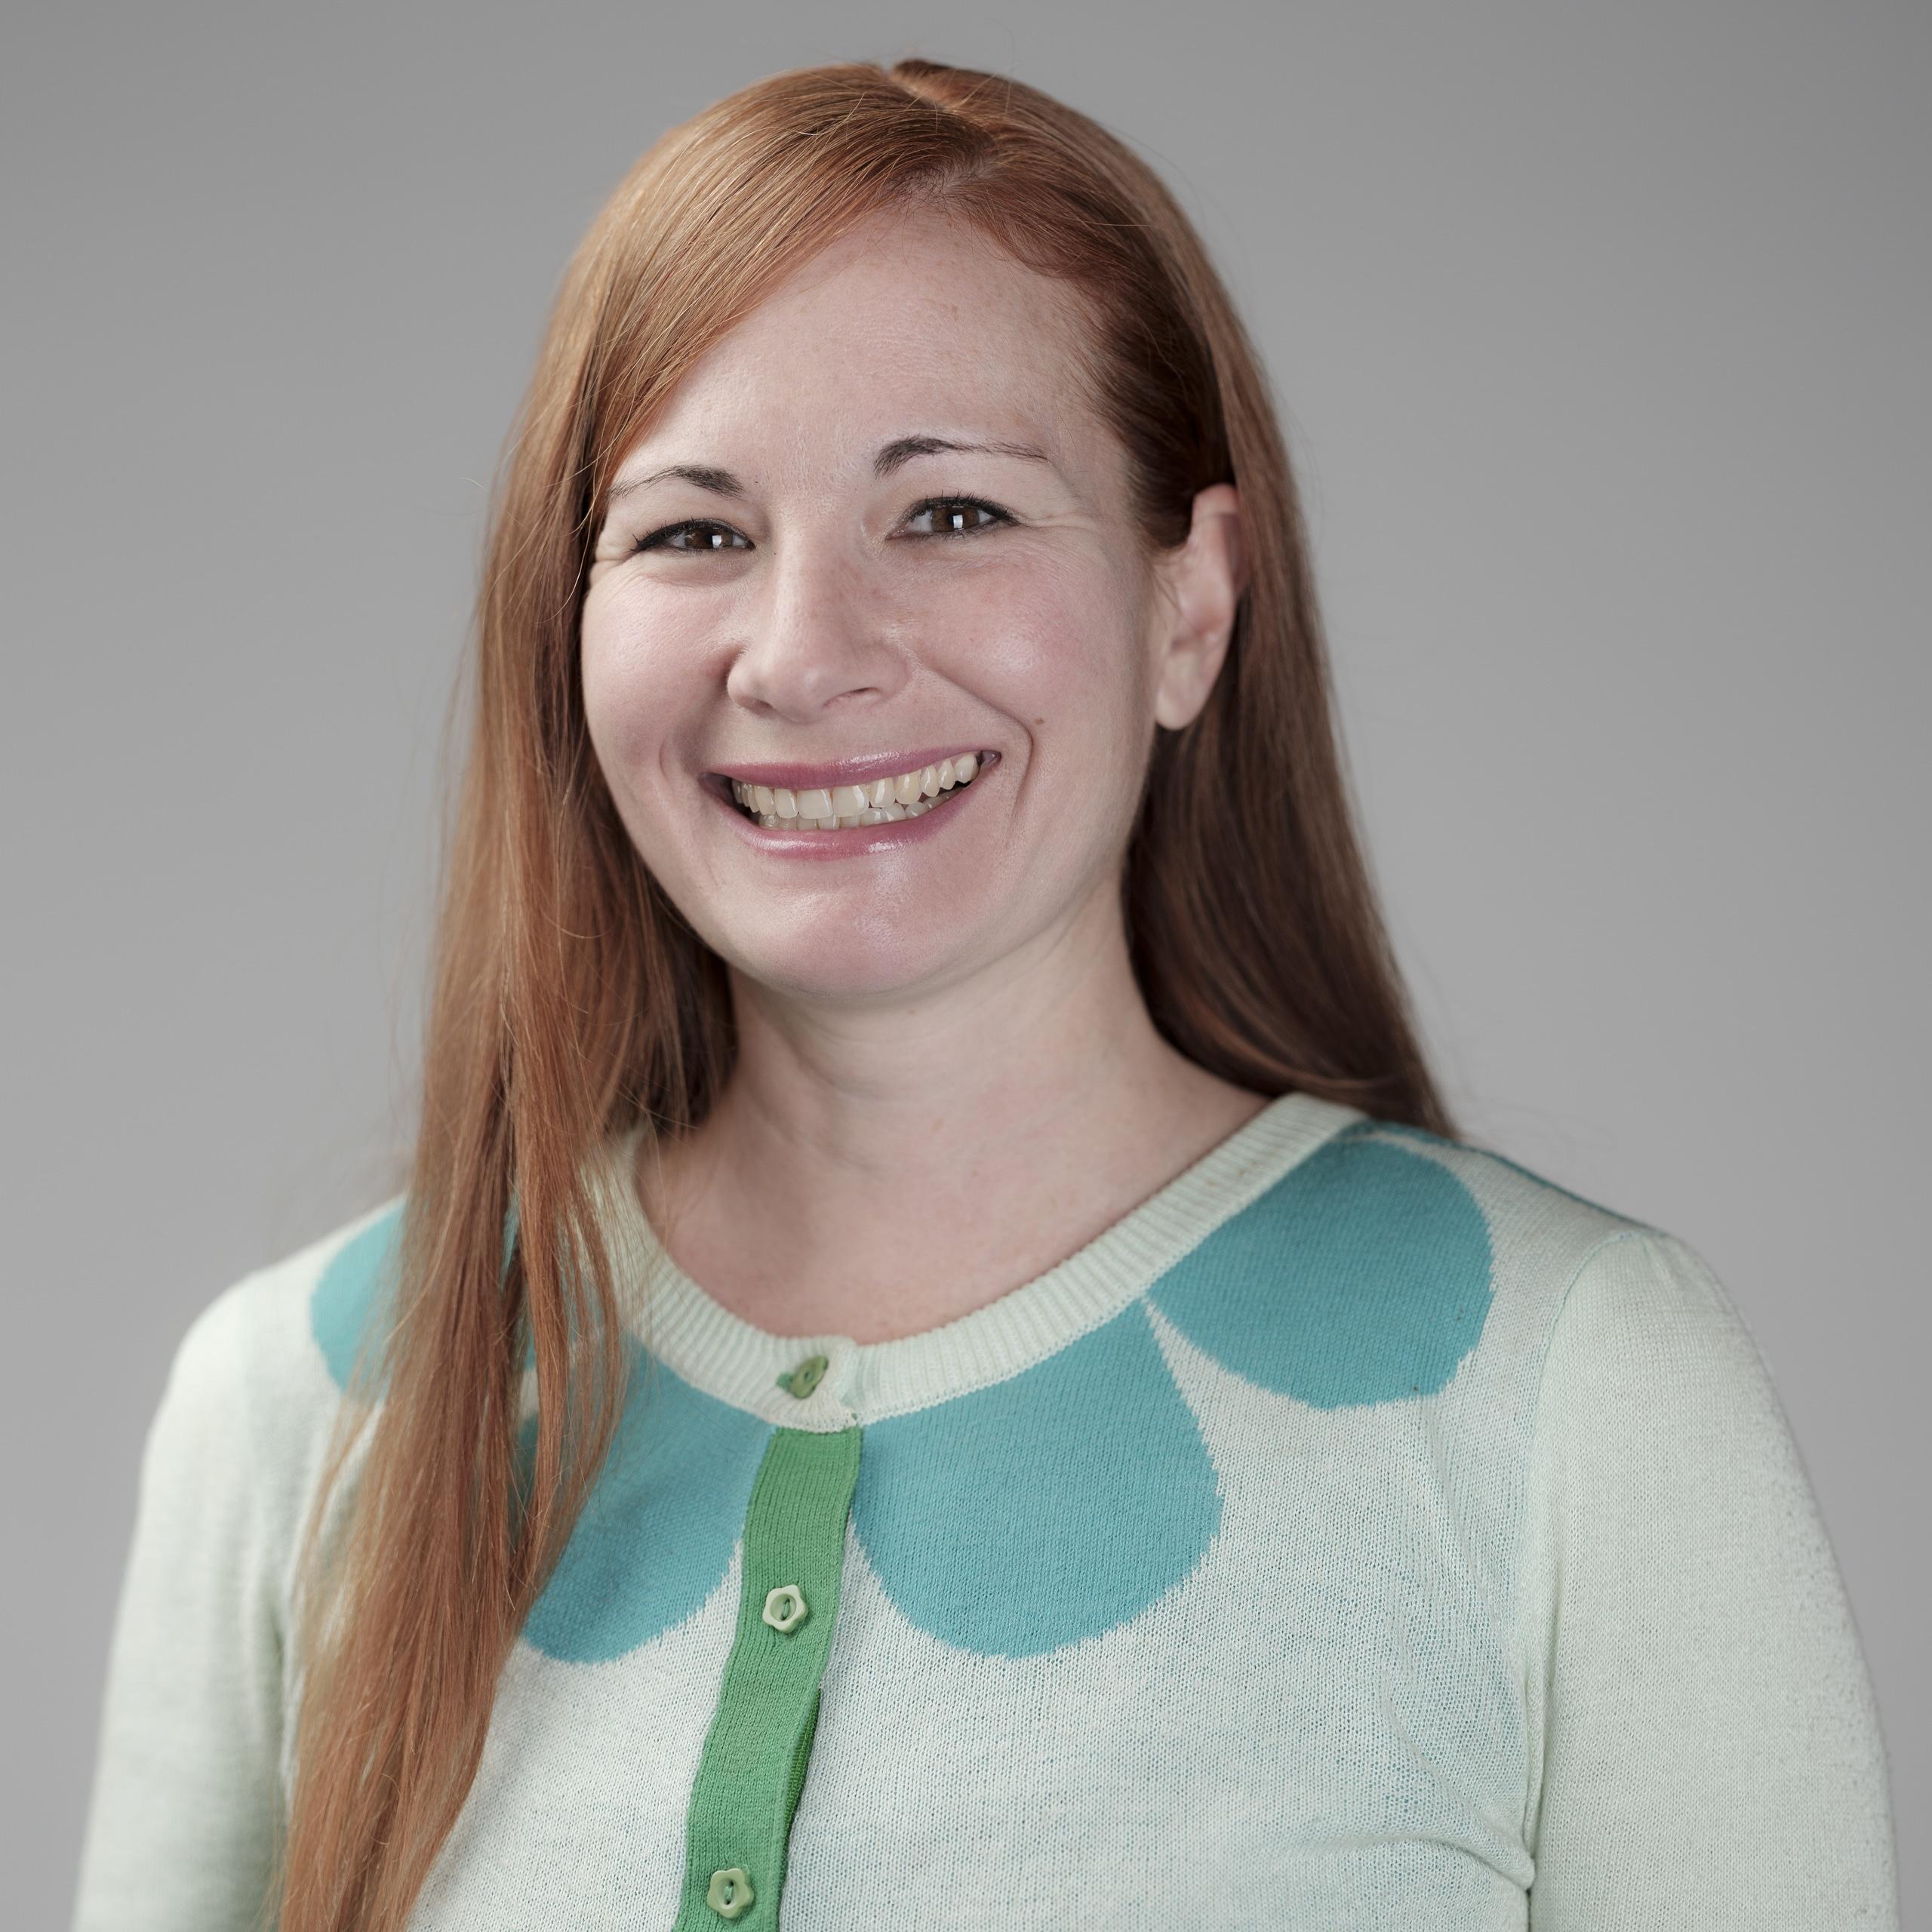 Beth Karevicius